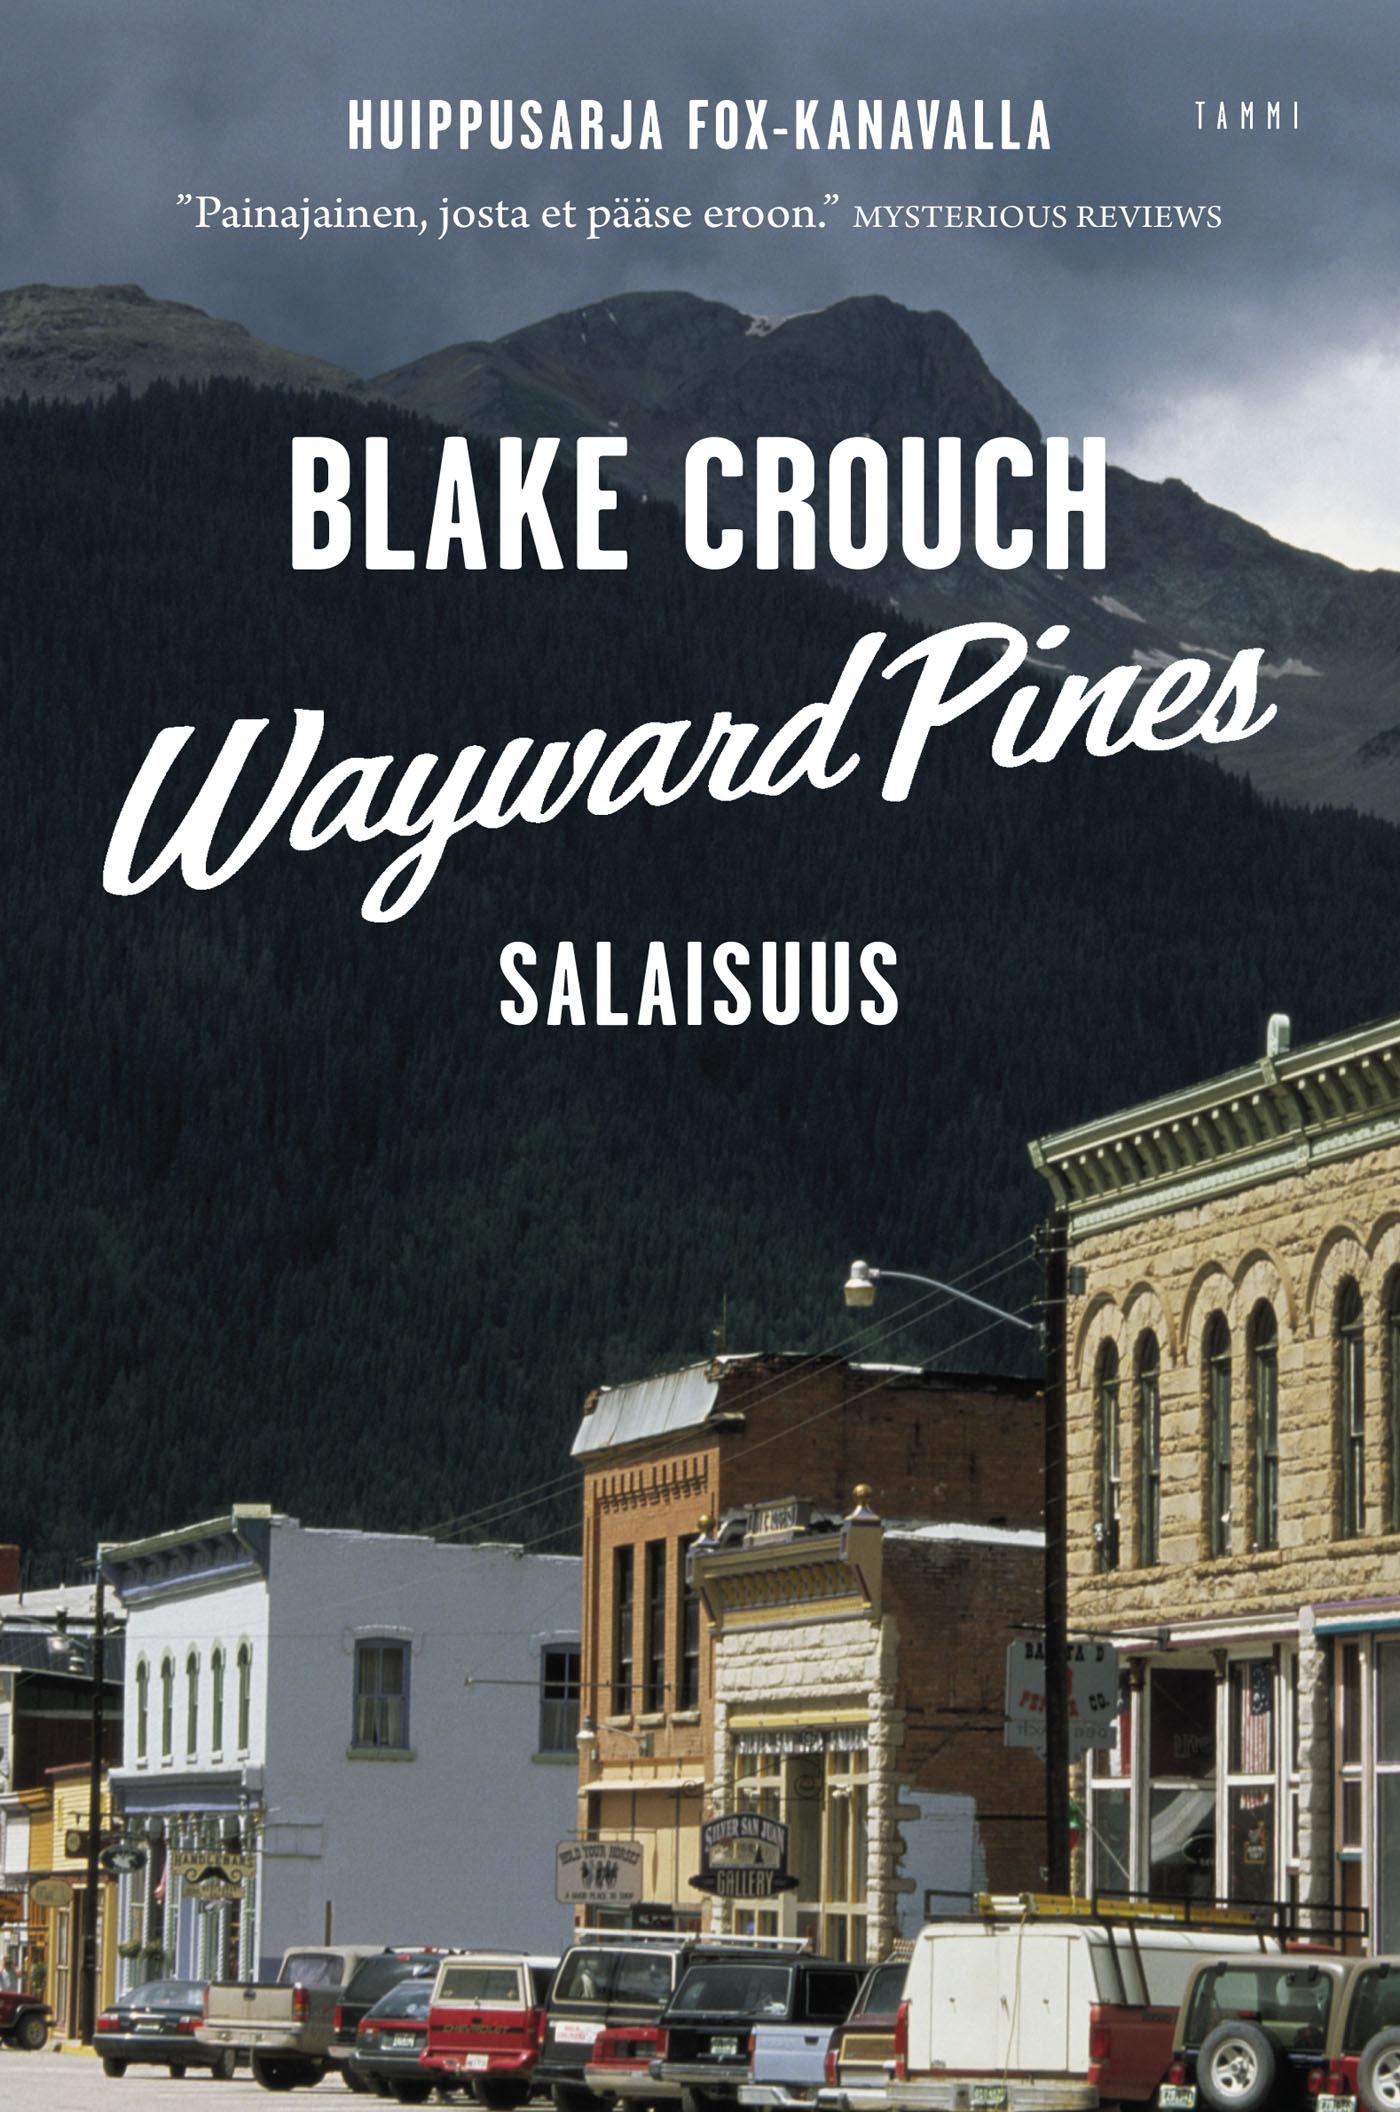 Crouch, Blake - Wayward Pines: Salaisuus, e-kirja